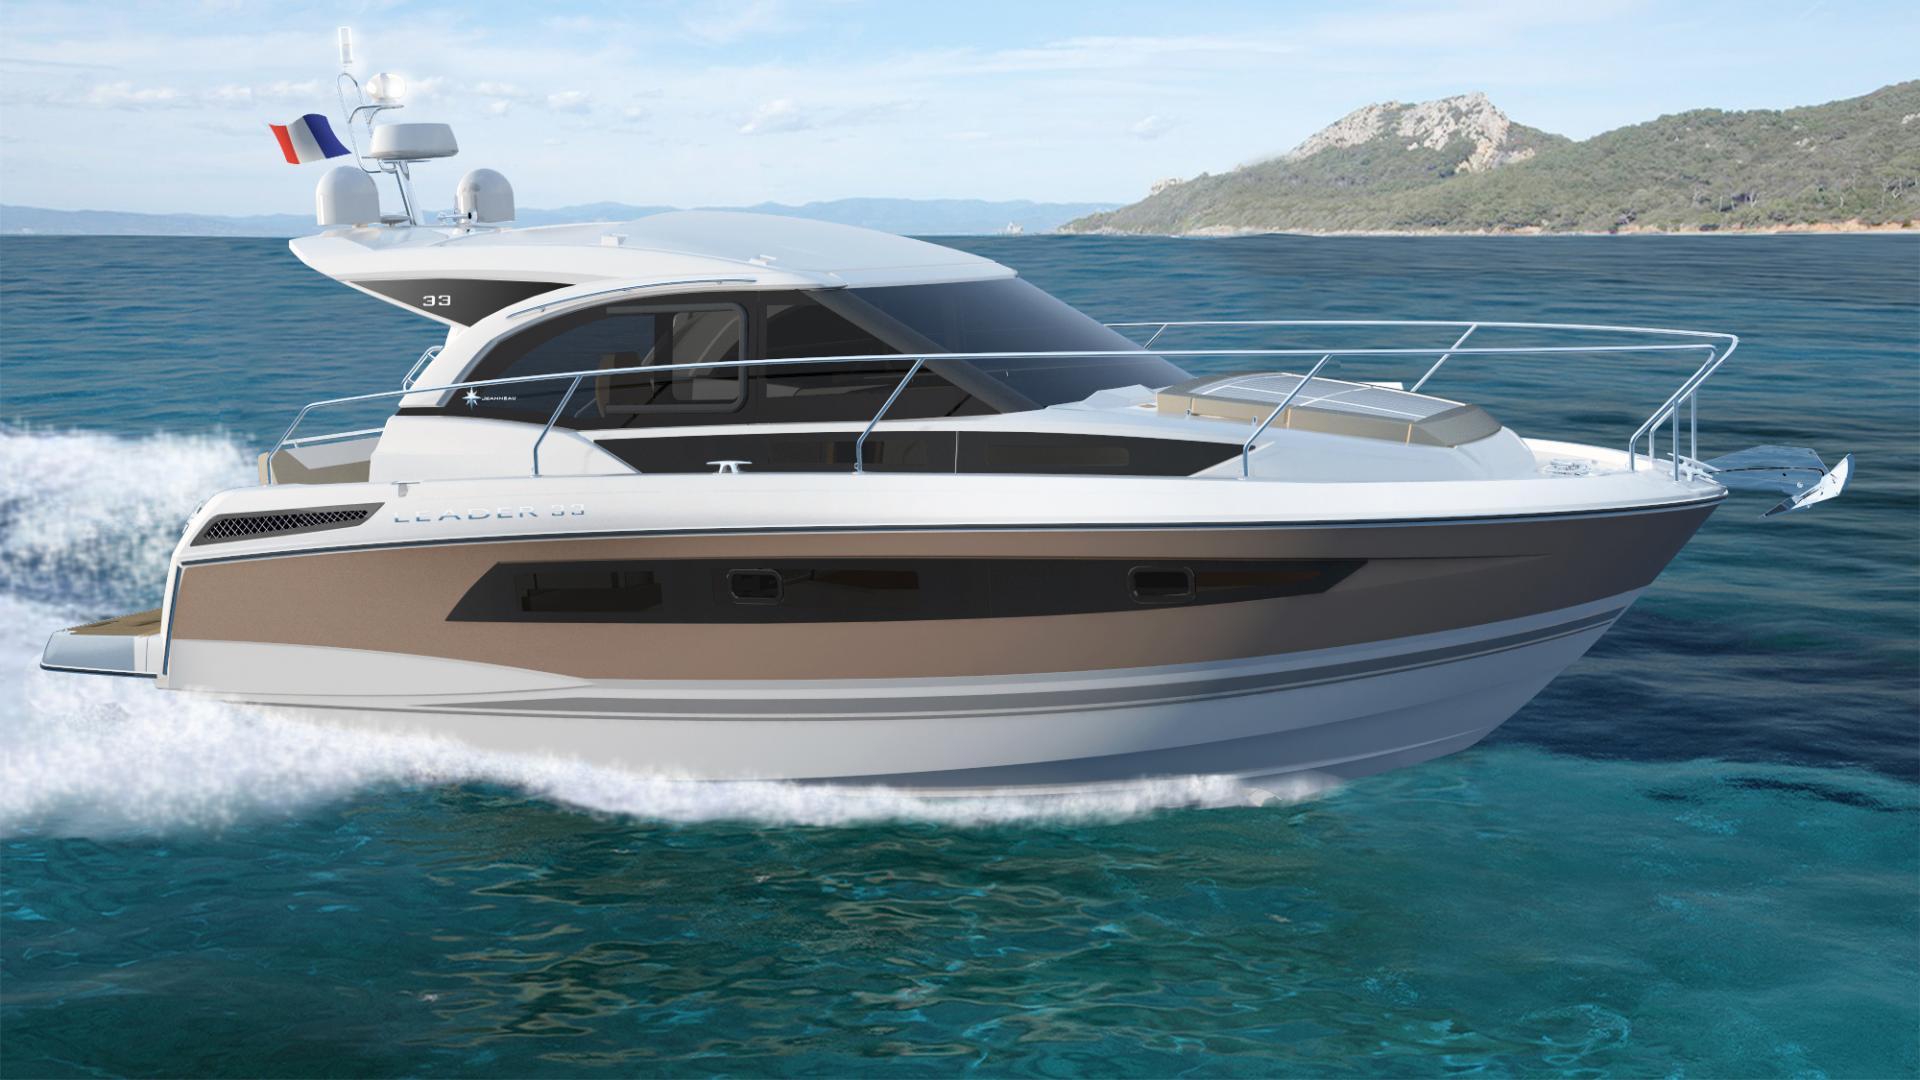 jeanneau leader 33 bateau moteur fiche. Black Bedroom Furniture Sets. Home Design Ideas